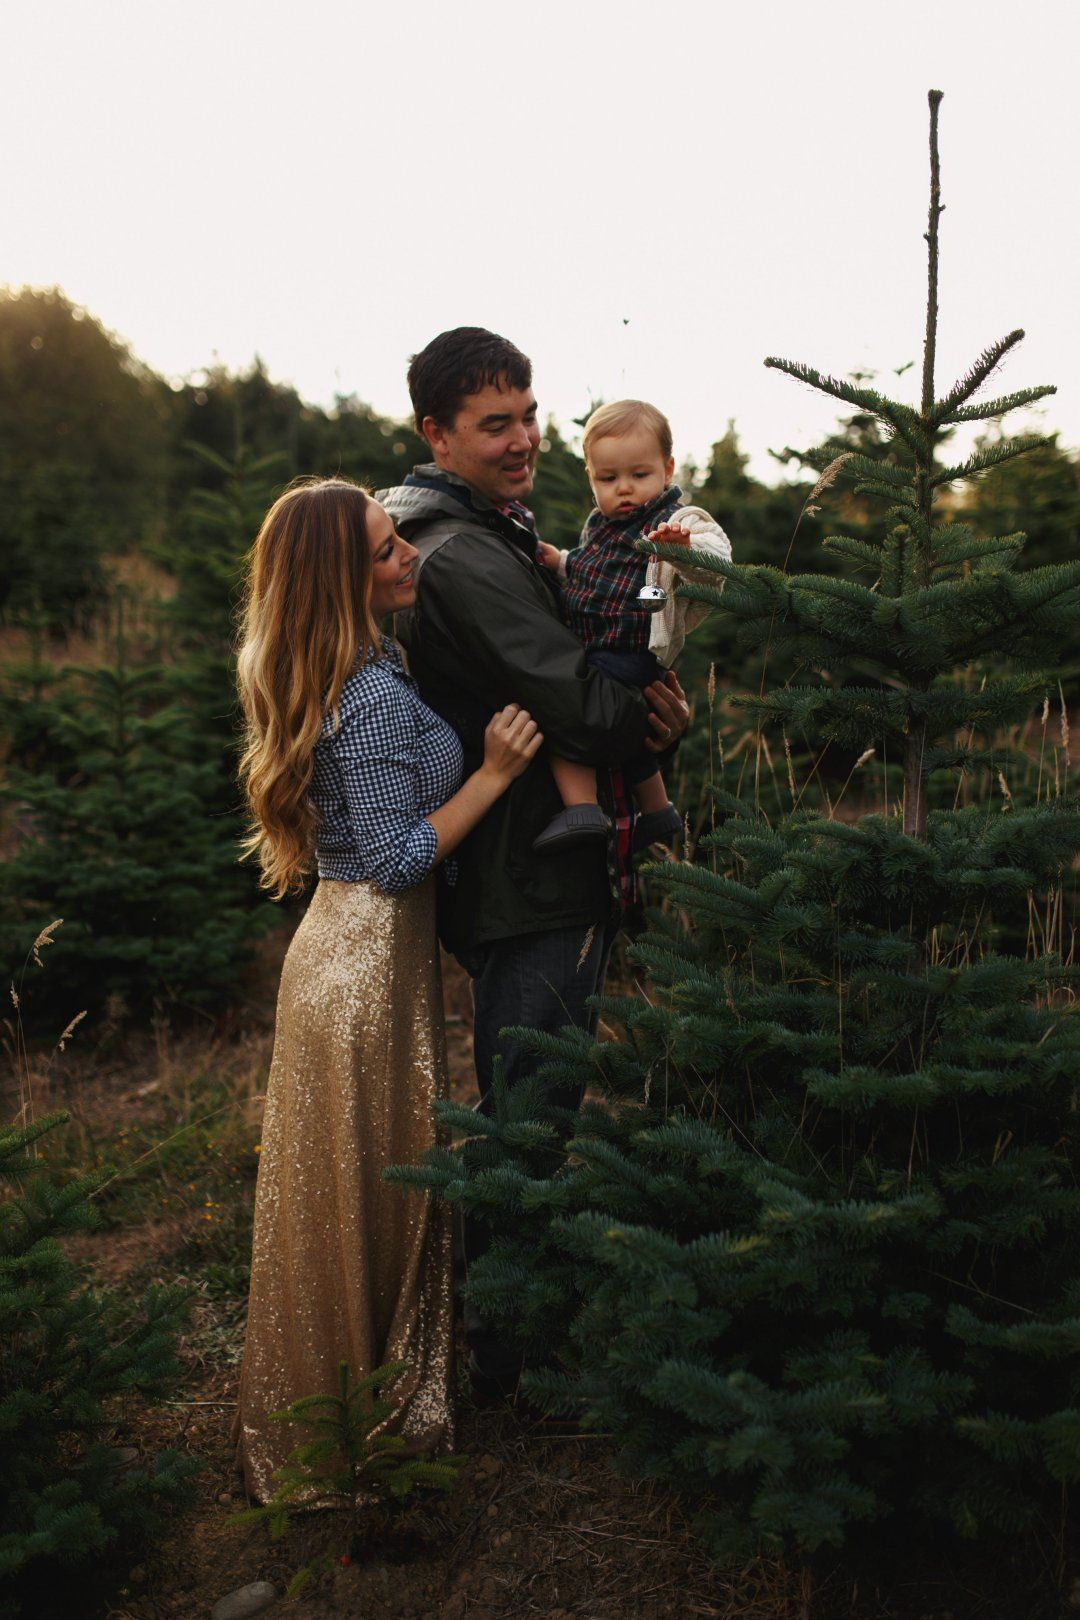 A December To Remember Bainbridge Boheme Family Holiday Photos Christmas Family Photos Christmas Tree Farm Photo Shoot